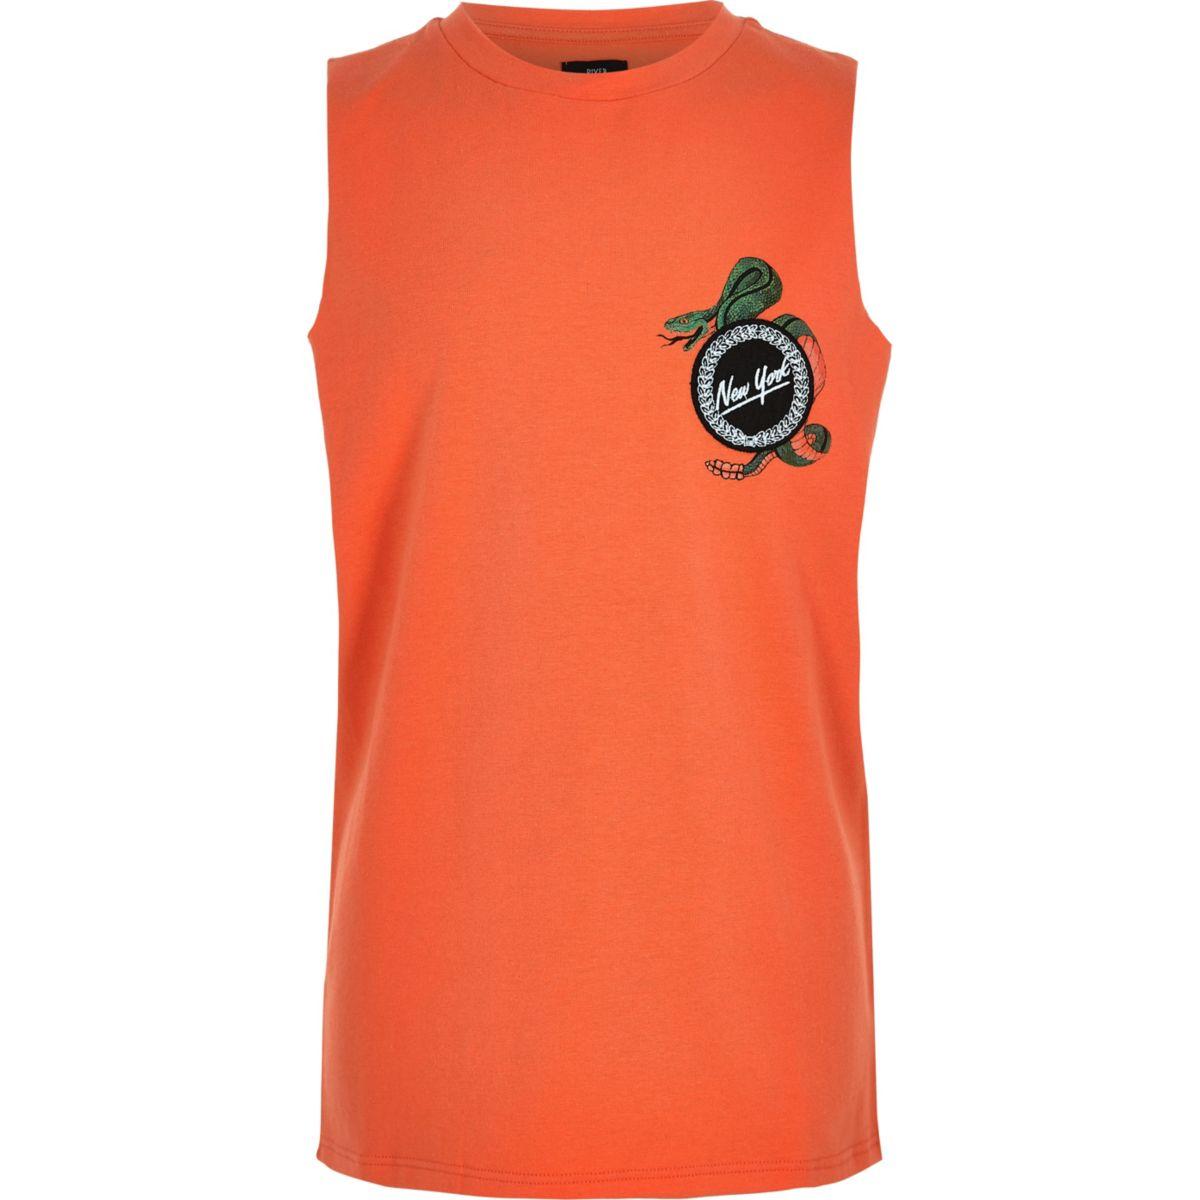 Boys orange 'New York' badge tank